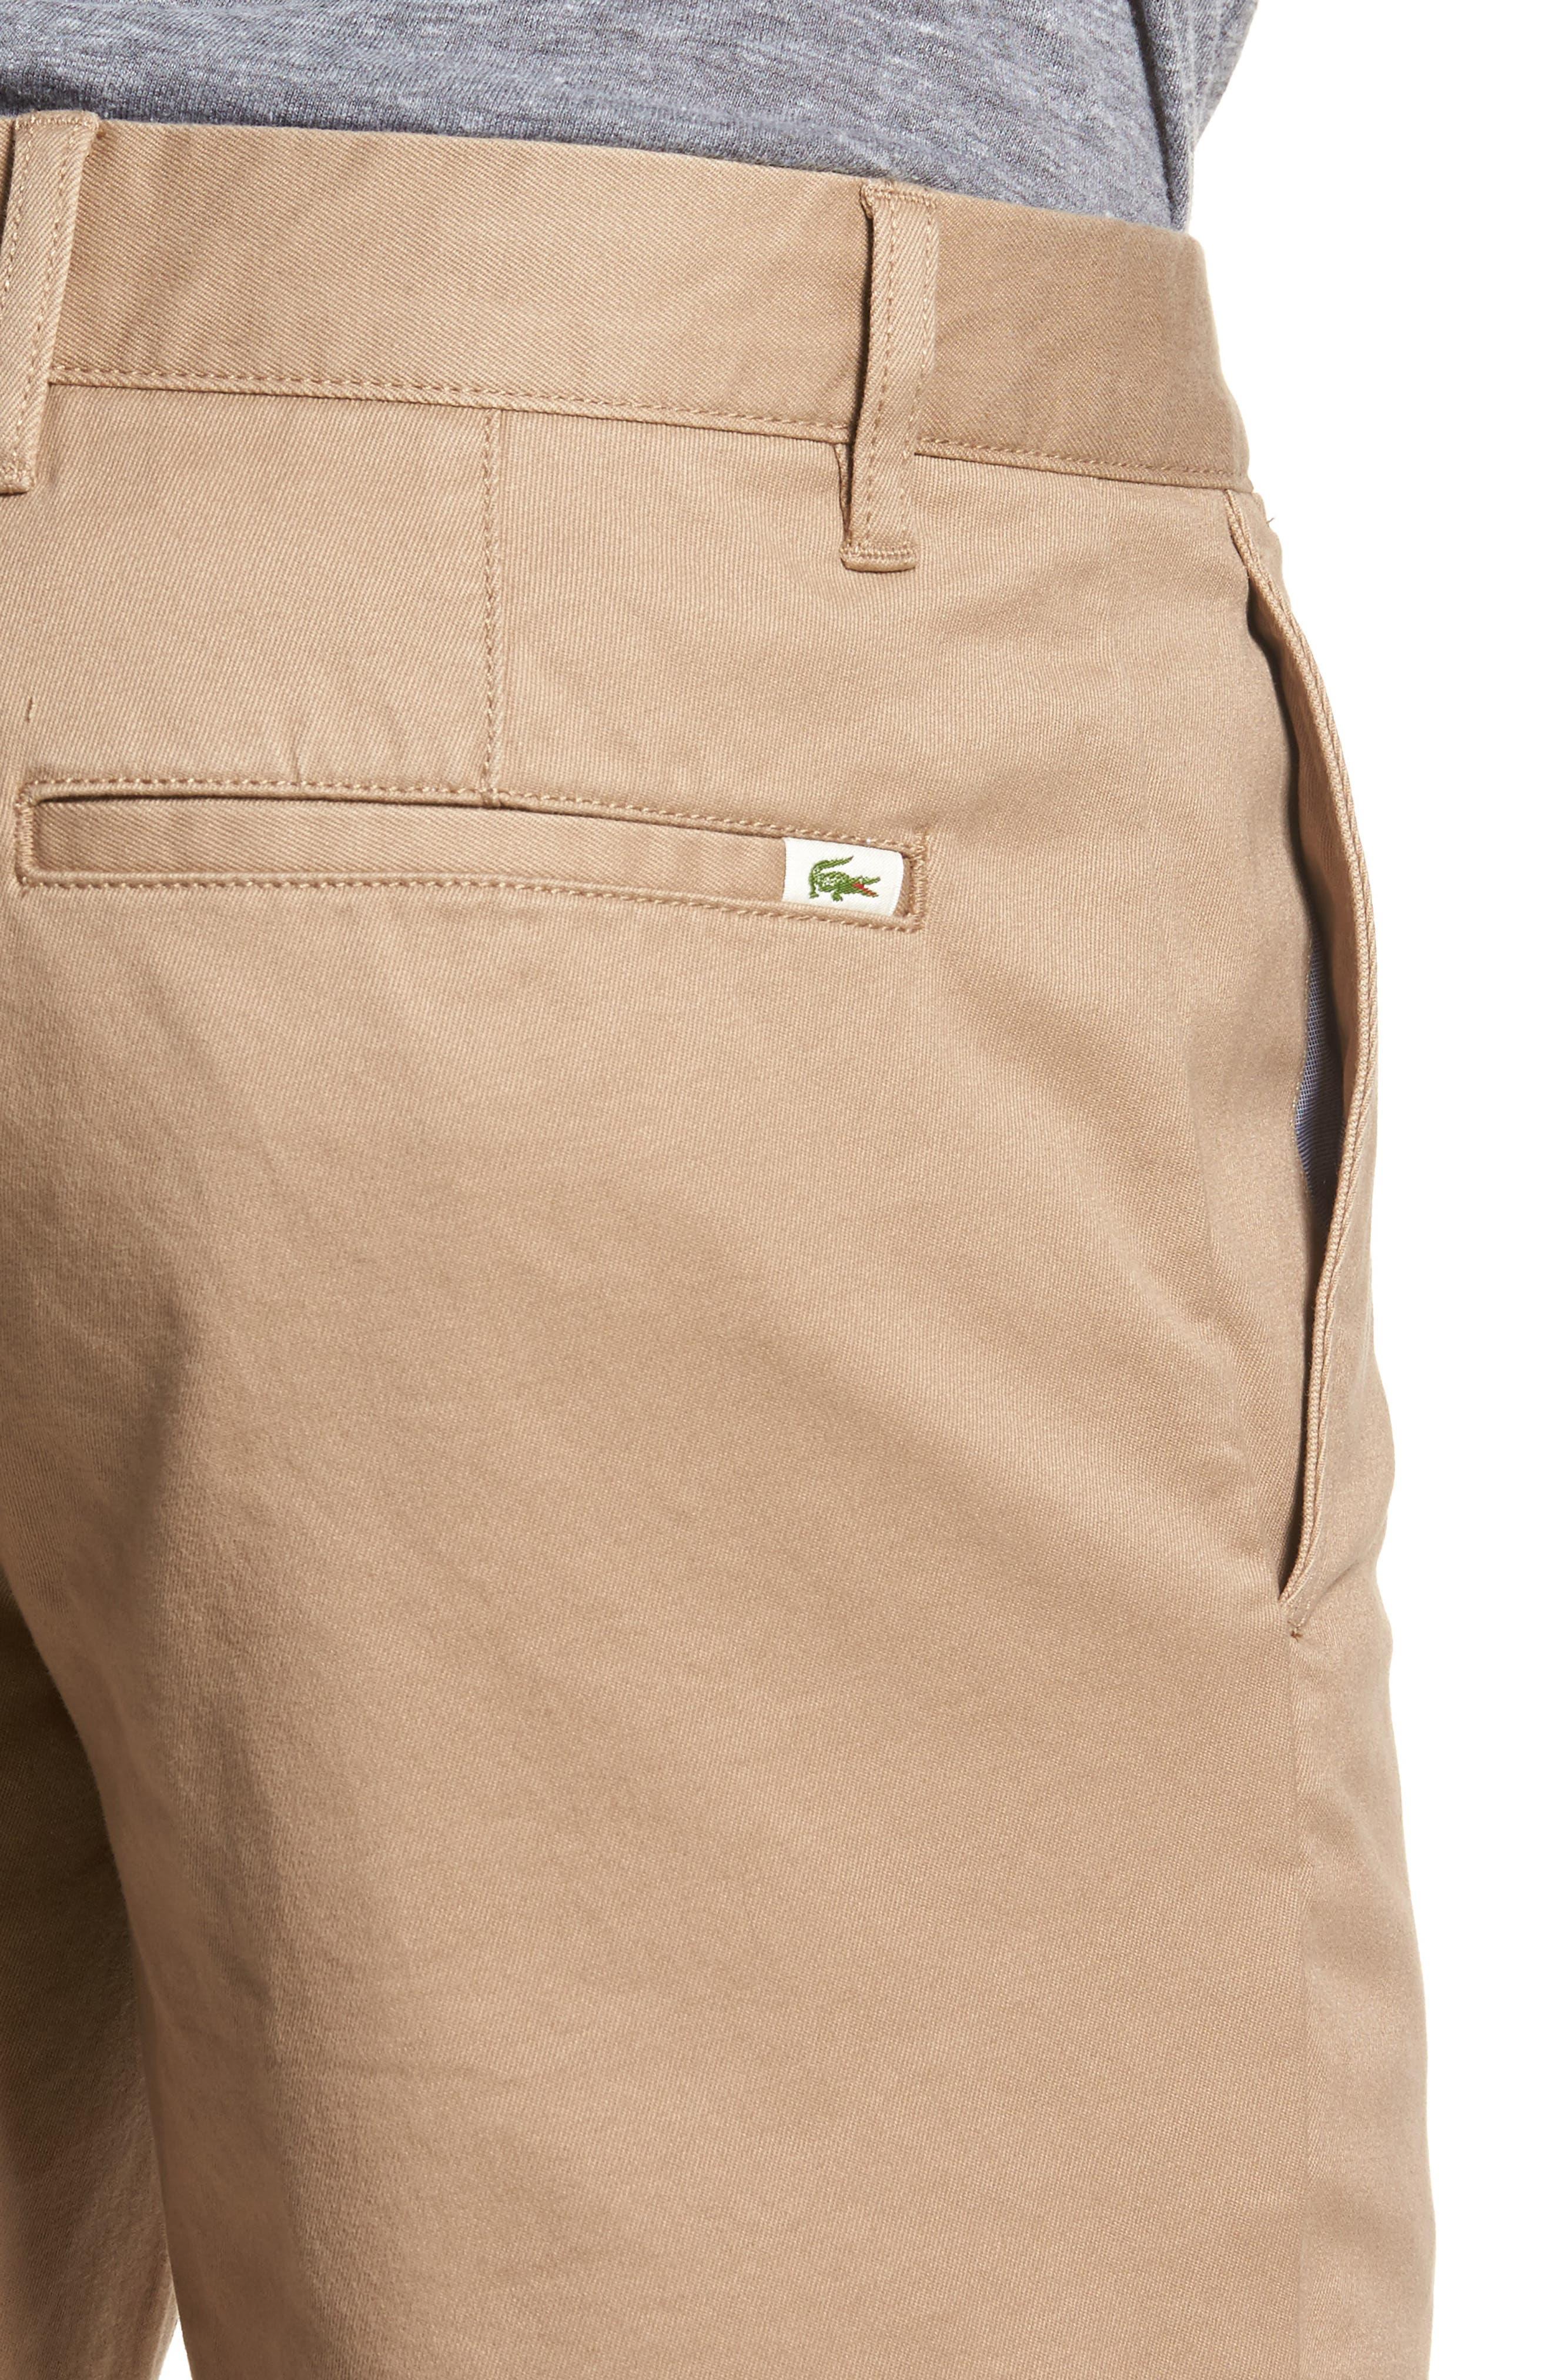 Slim Fit Chino Shorts,                             Alternate thumbnail 4, color,                             Kraft Beige